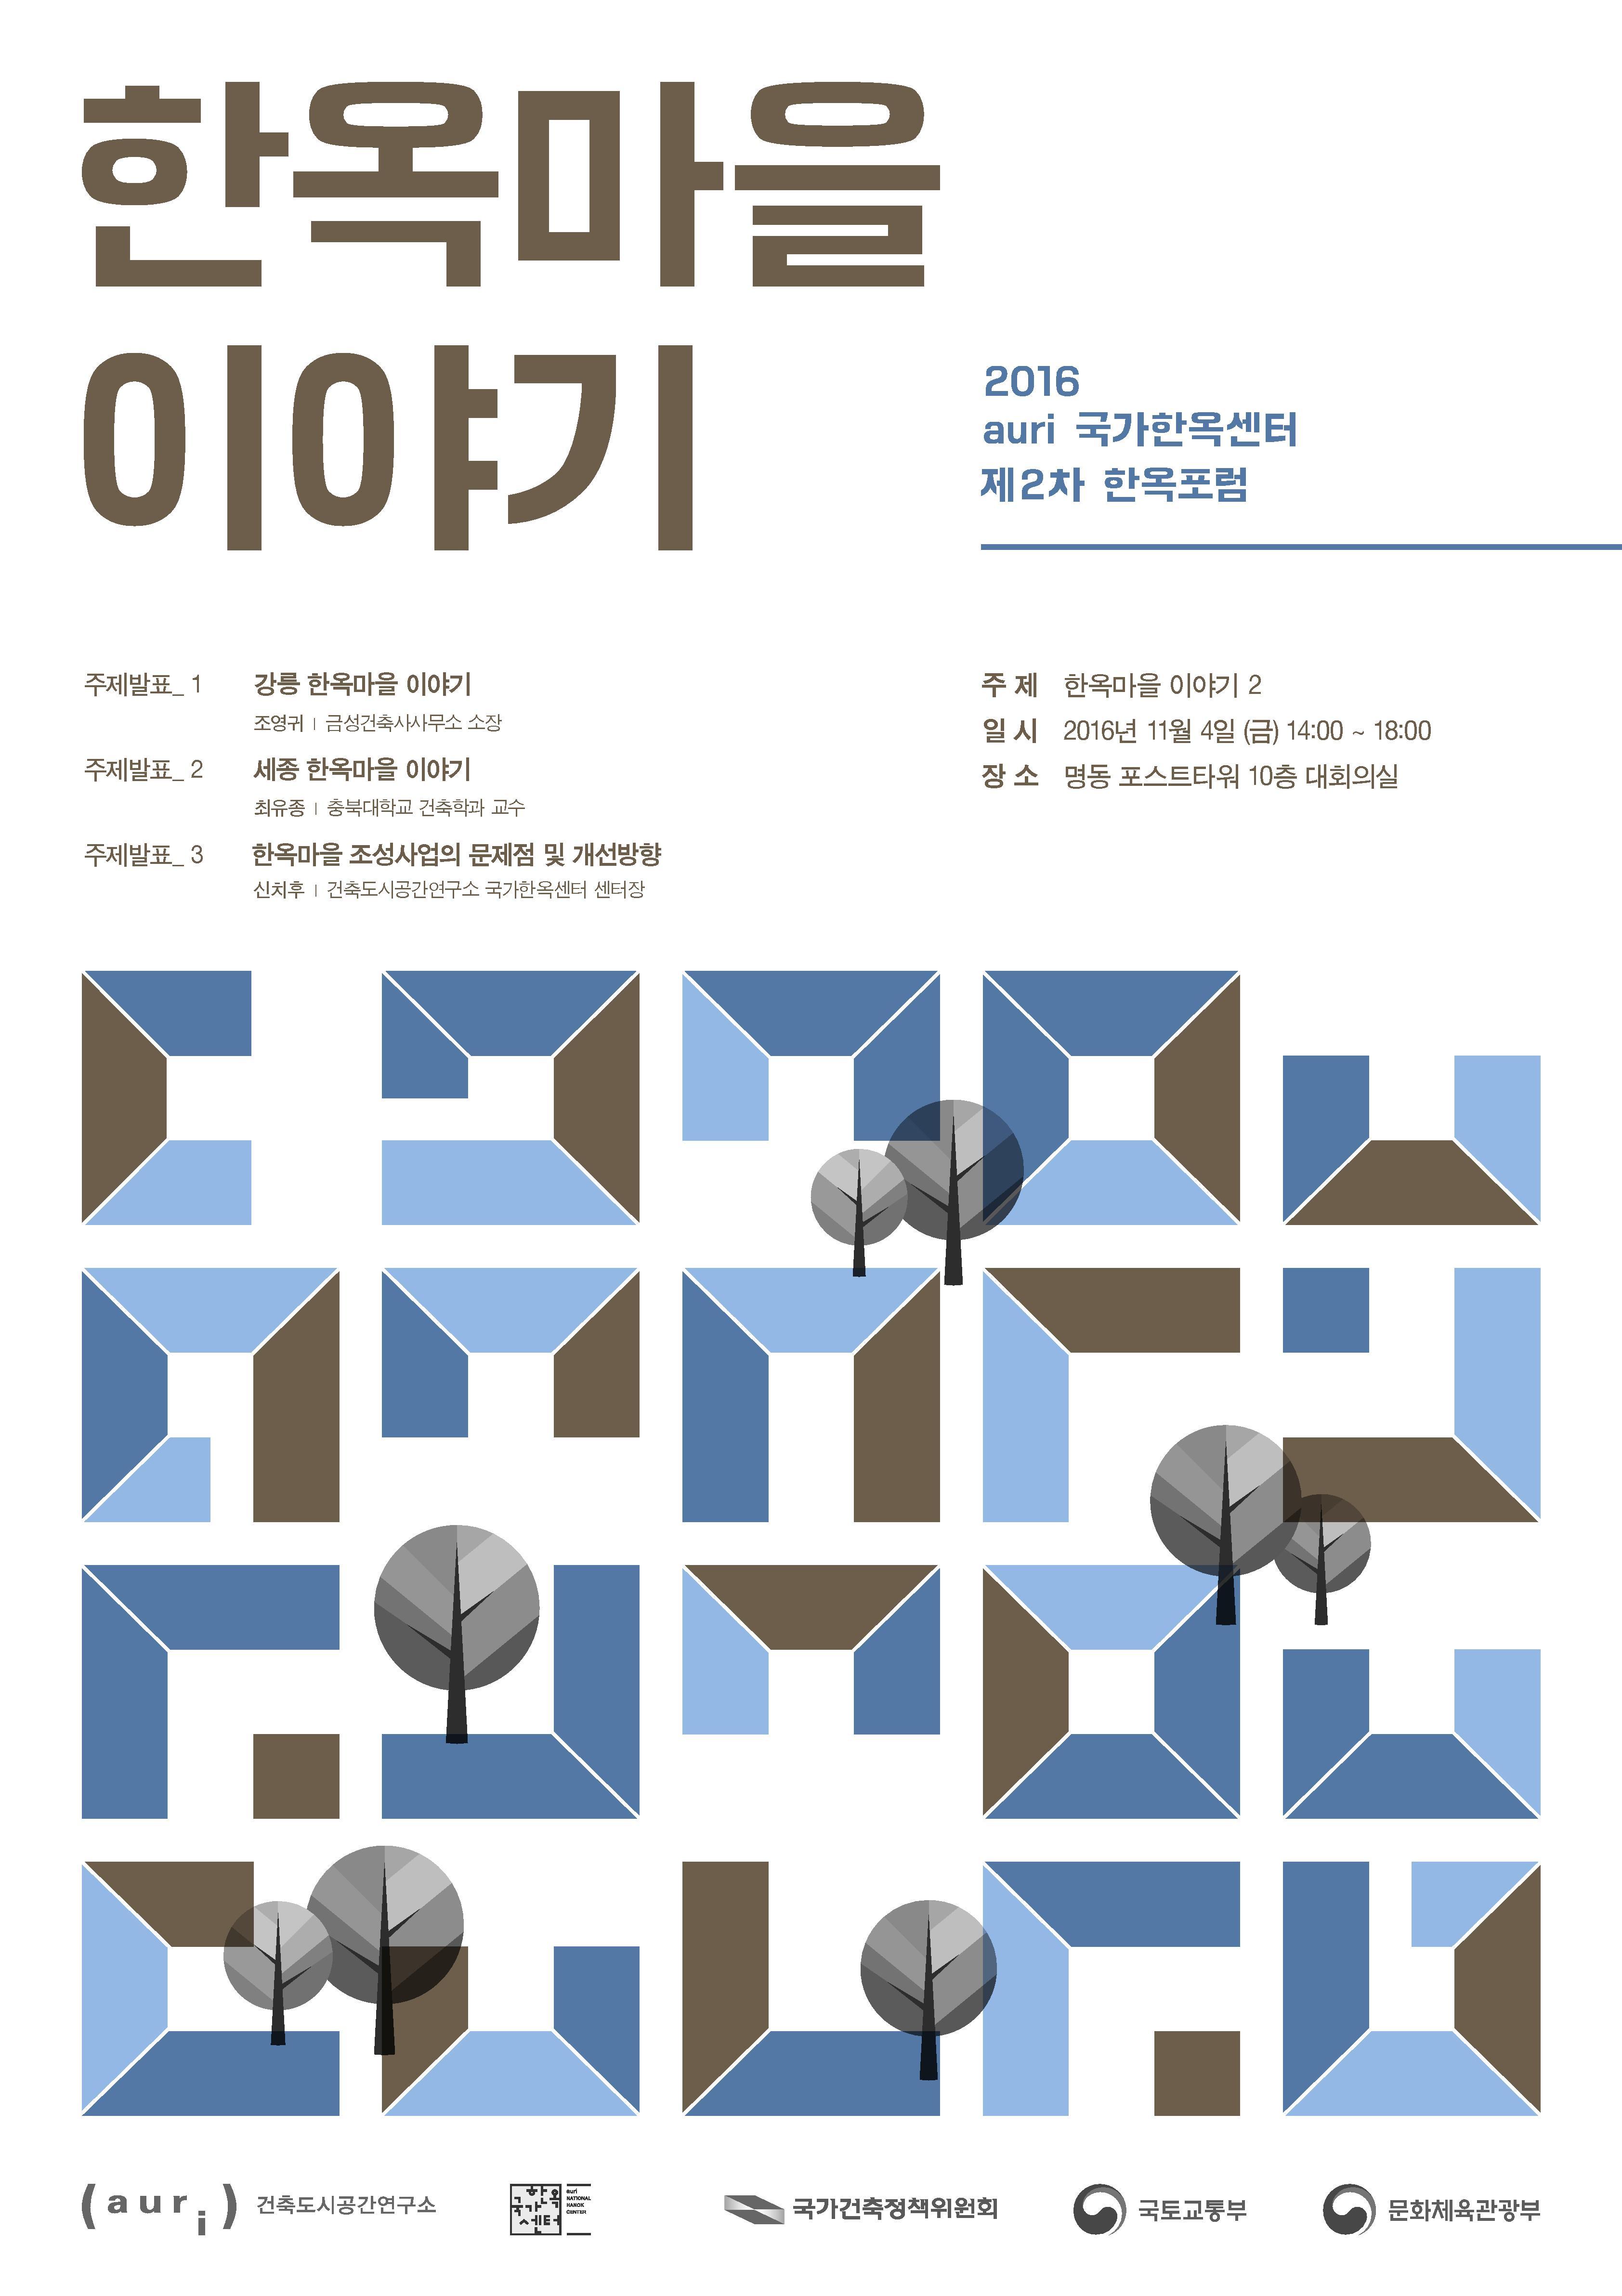 auri 제2차 한옥포럼-포스터_1.jpg